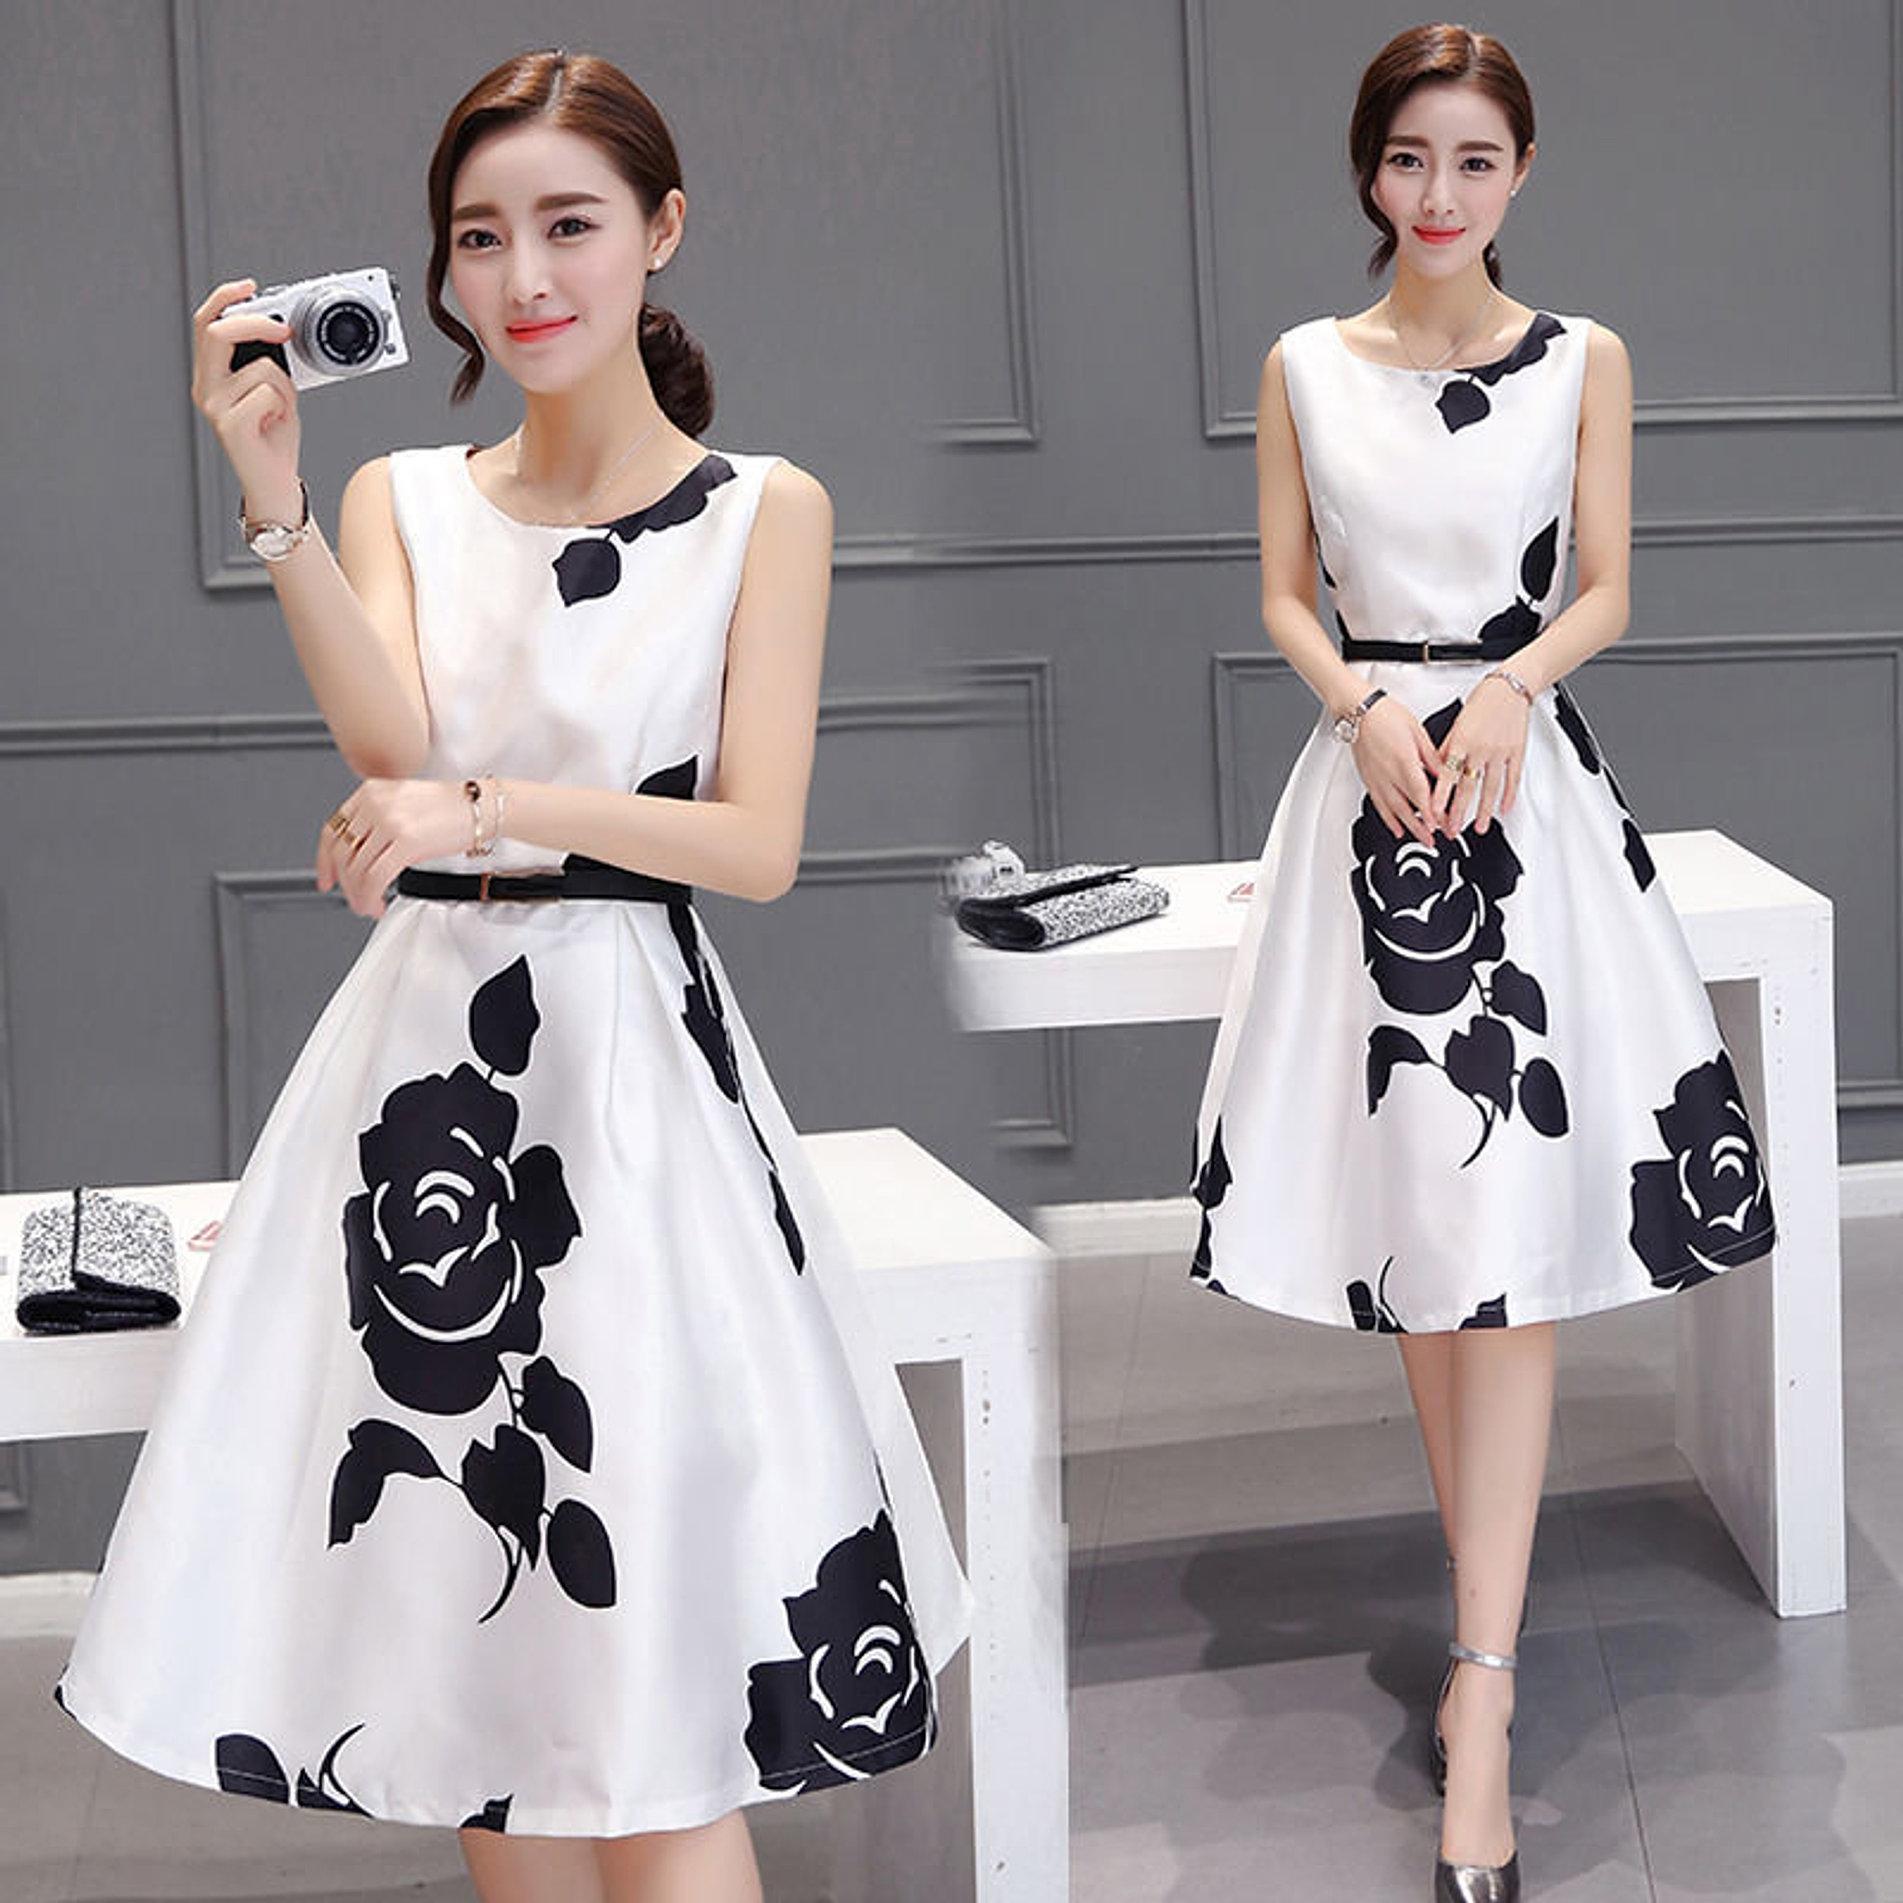 Ropa hombre koreanstyle ropa coreana y asiatica mexico for Pantalones asiaticos